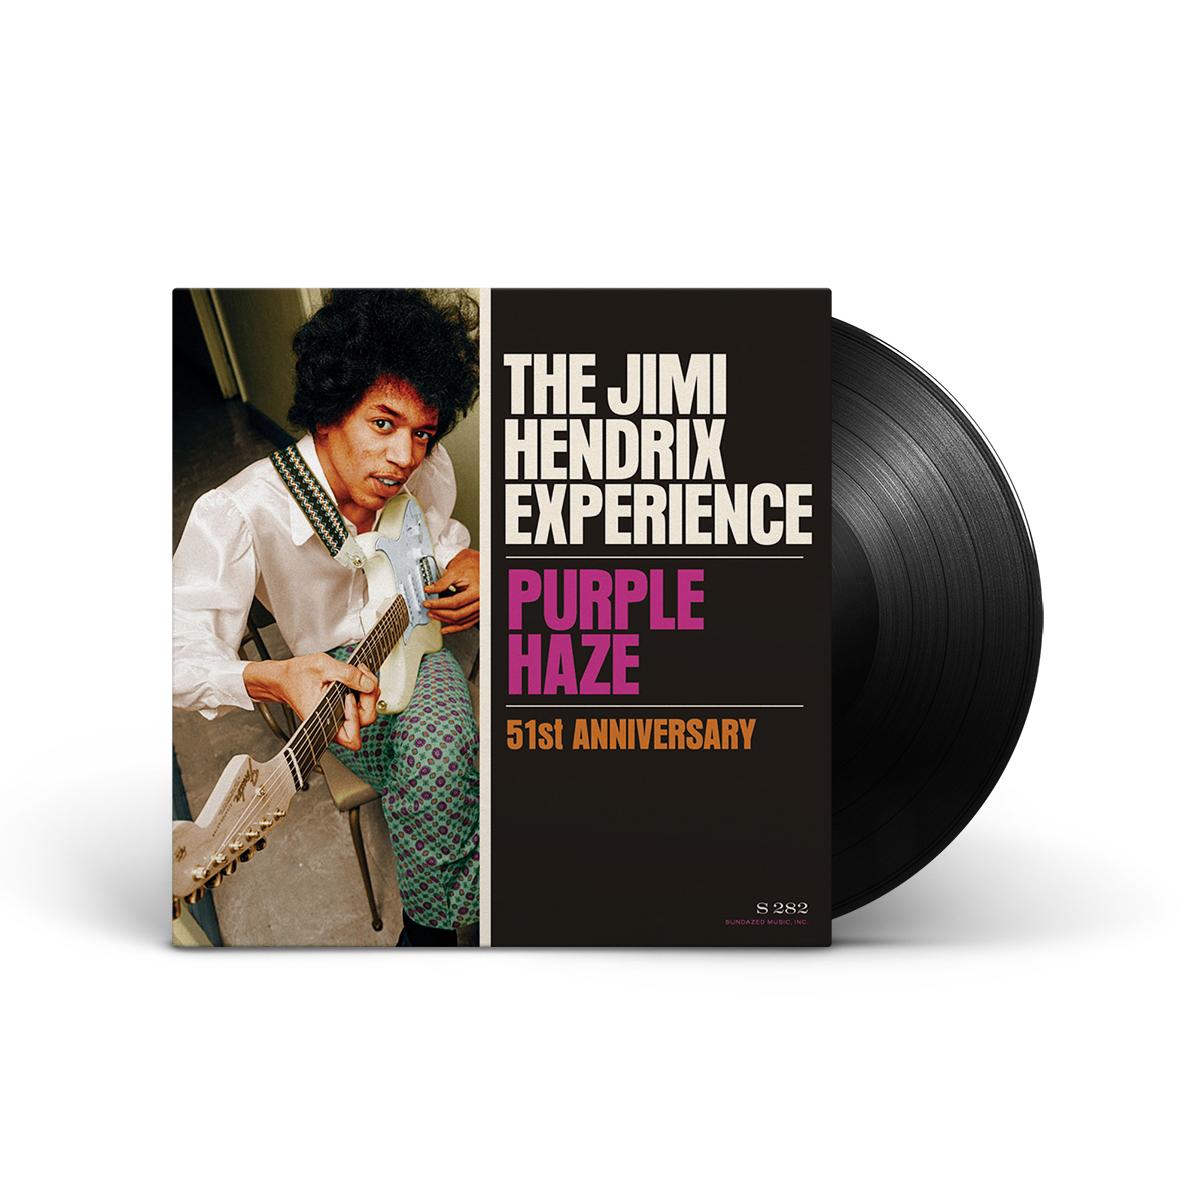 "Jimi Hendrix - Purple Haze/51st Anniversary 7"" LP"